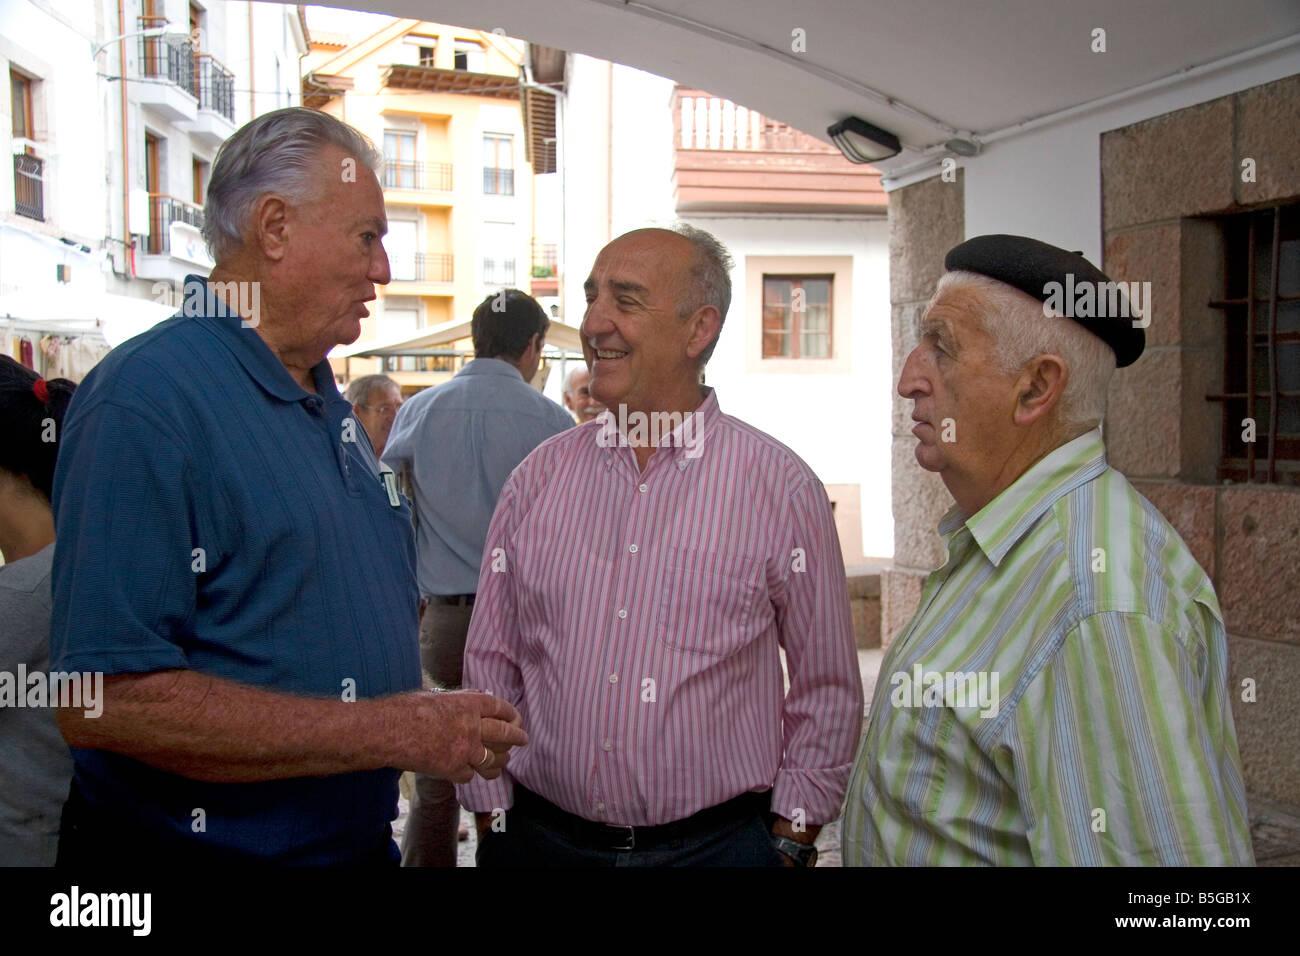 Spanish men